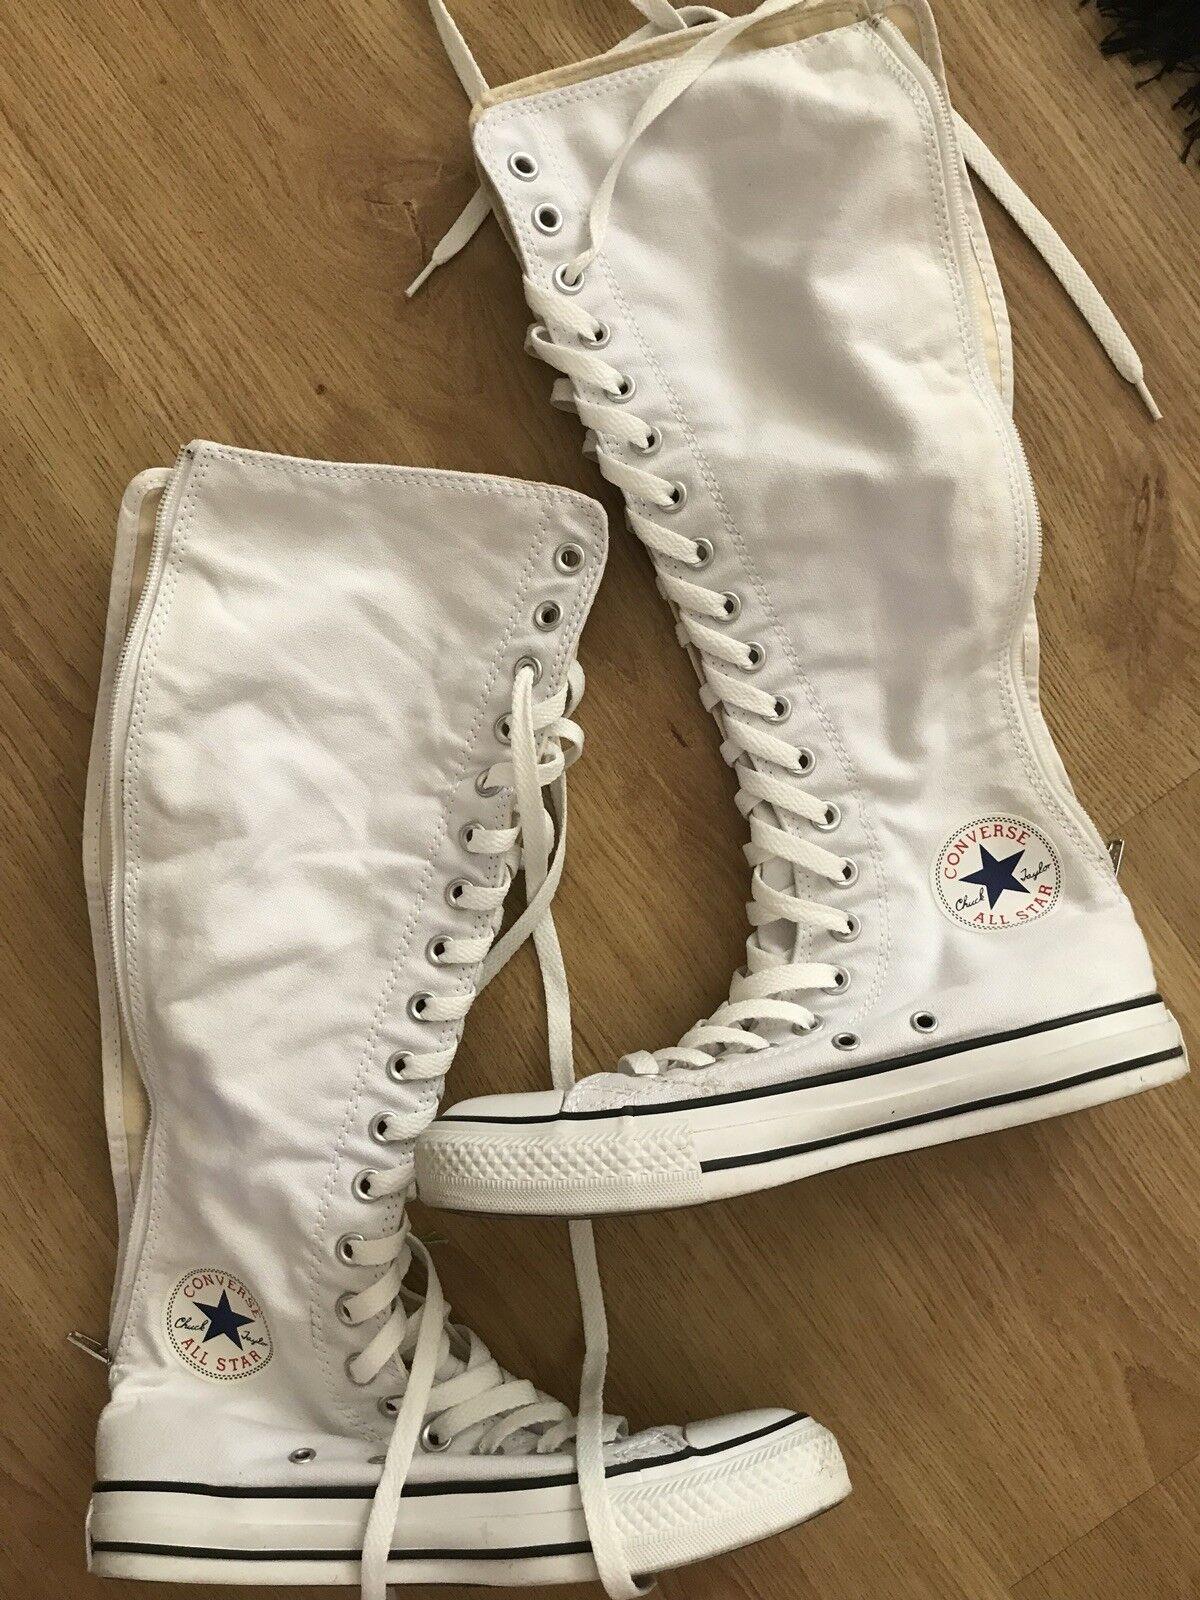 Bnwot women's Converse All Star Chuck Taylor Knee High Zip Back Boots Size 5